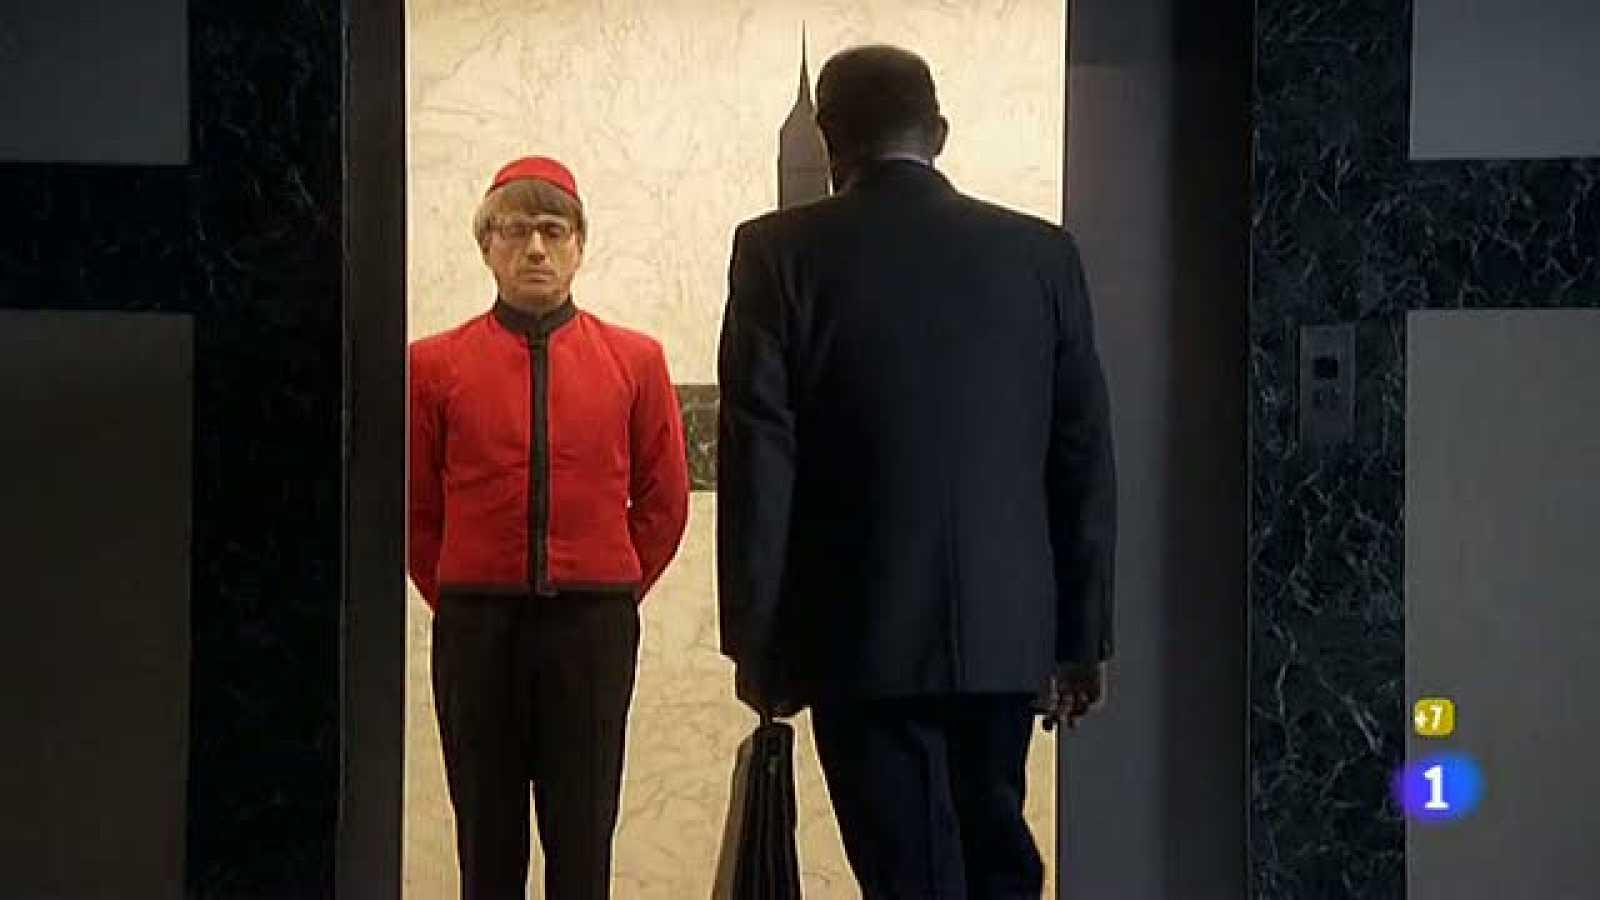 La hora de José Mota - Botones en el ascensor